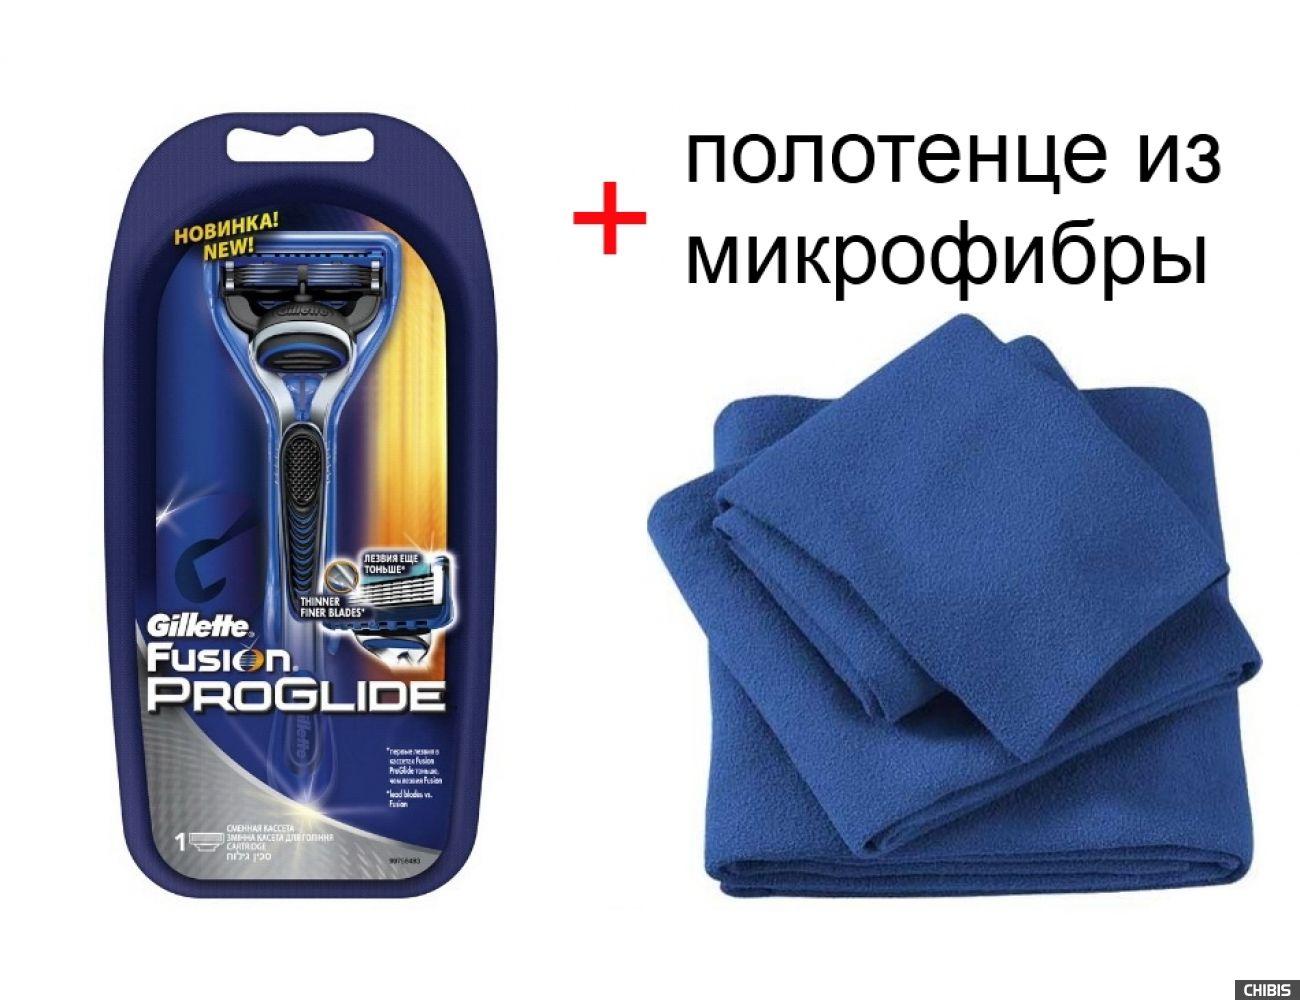 Gillette Fusion ProGlide станок с лезвием и полотенце 7702018310968